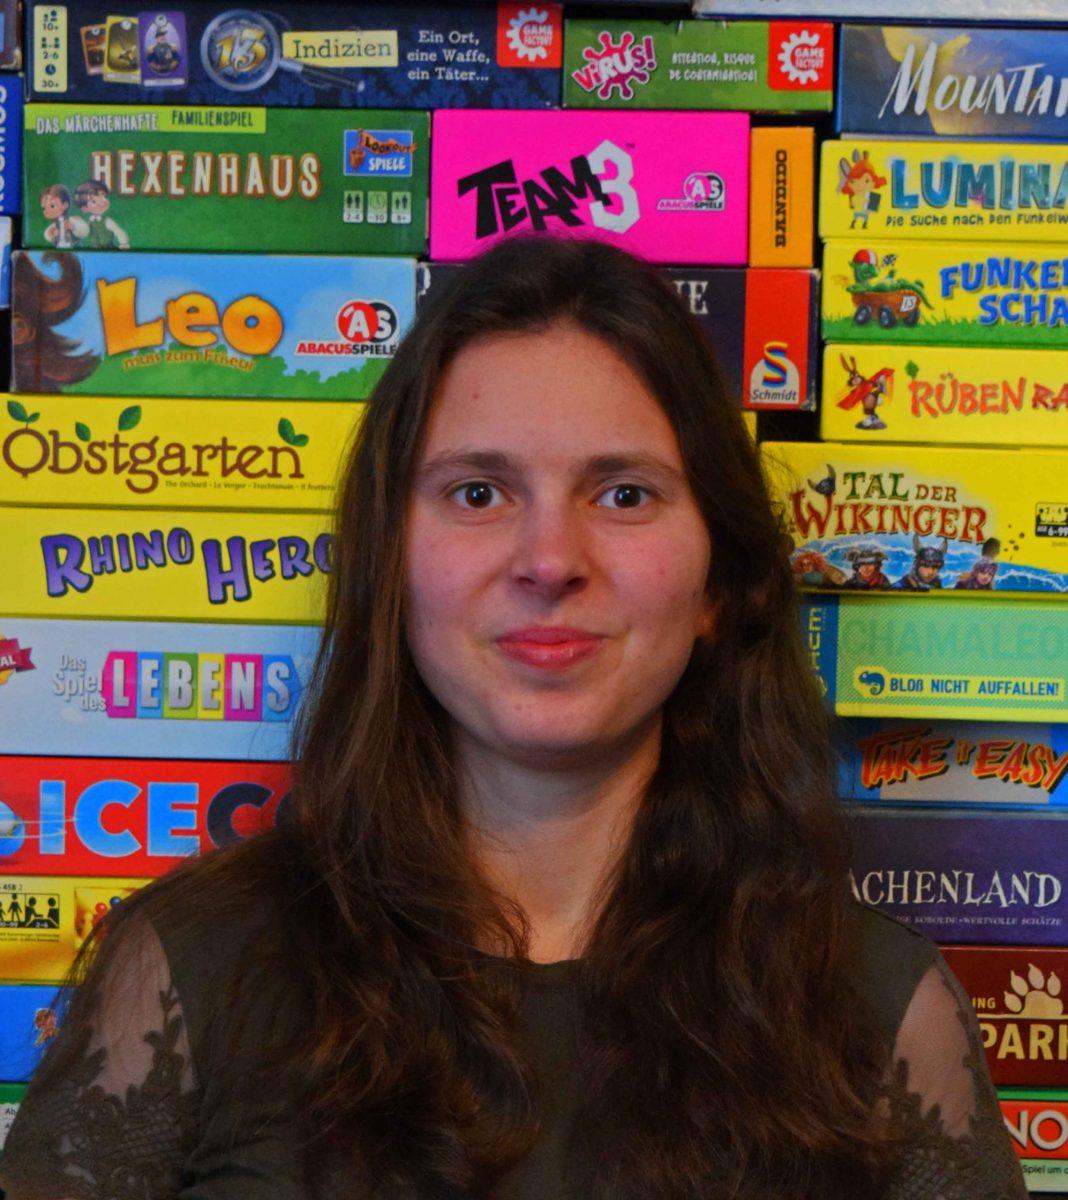 Sarah-Ann Orymek, Foto: privat